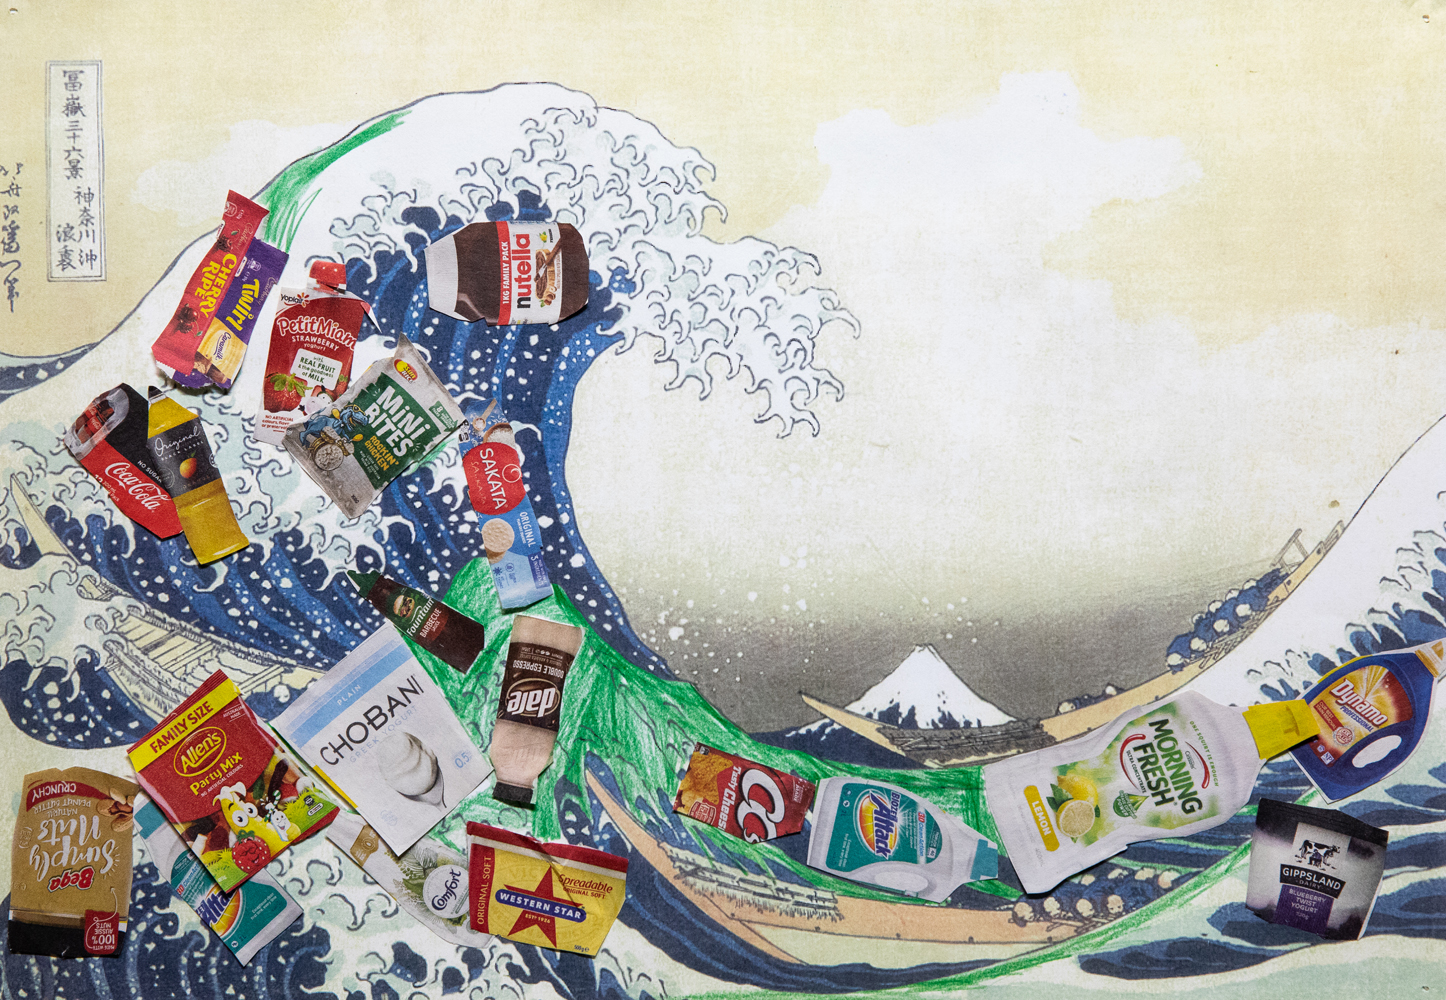 19. Daniel Reid, 'All the rubbish in the water', mixed media, Year 6, Drummond Memorial Public School